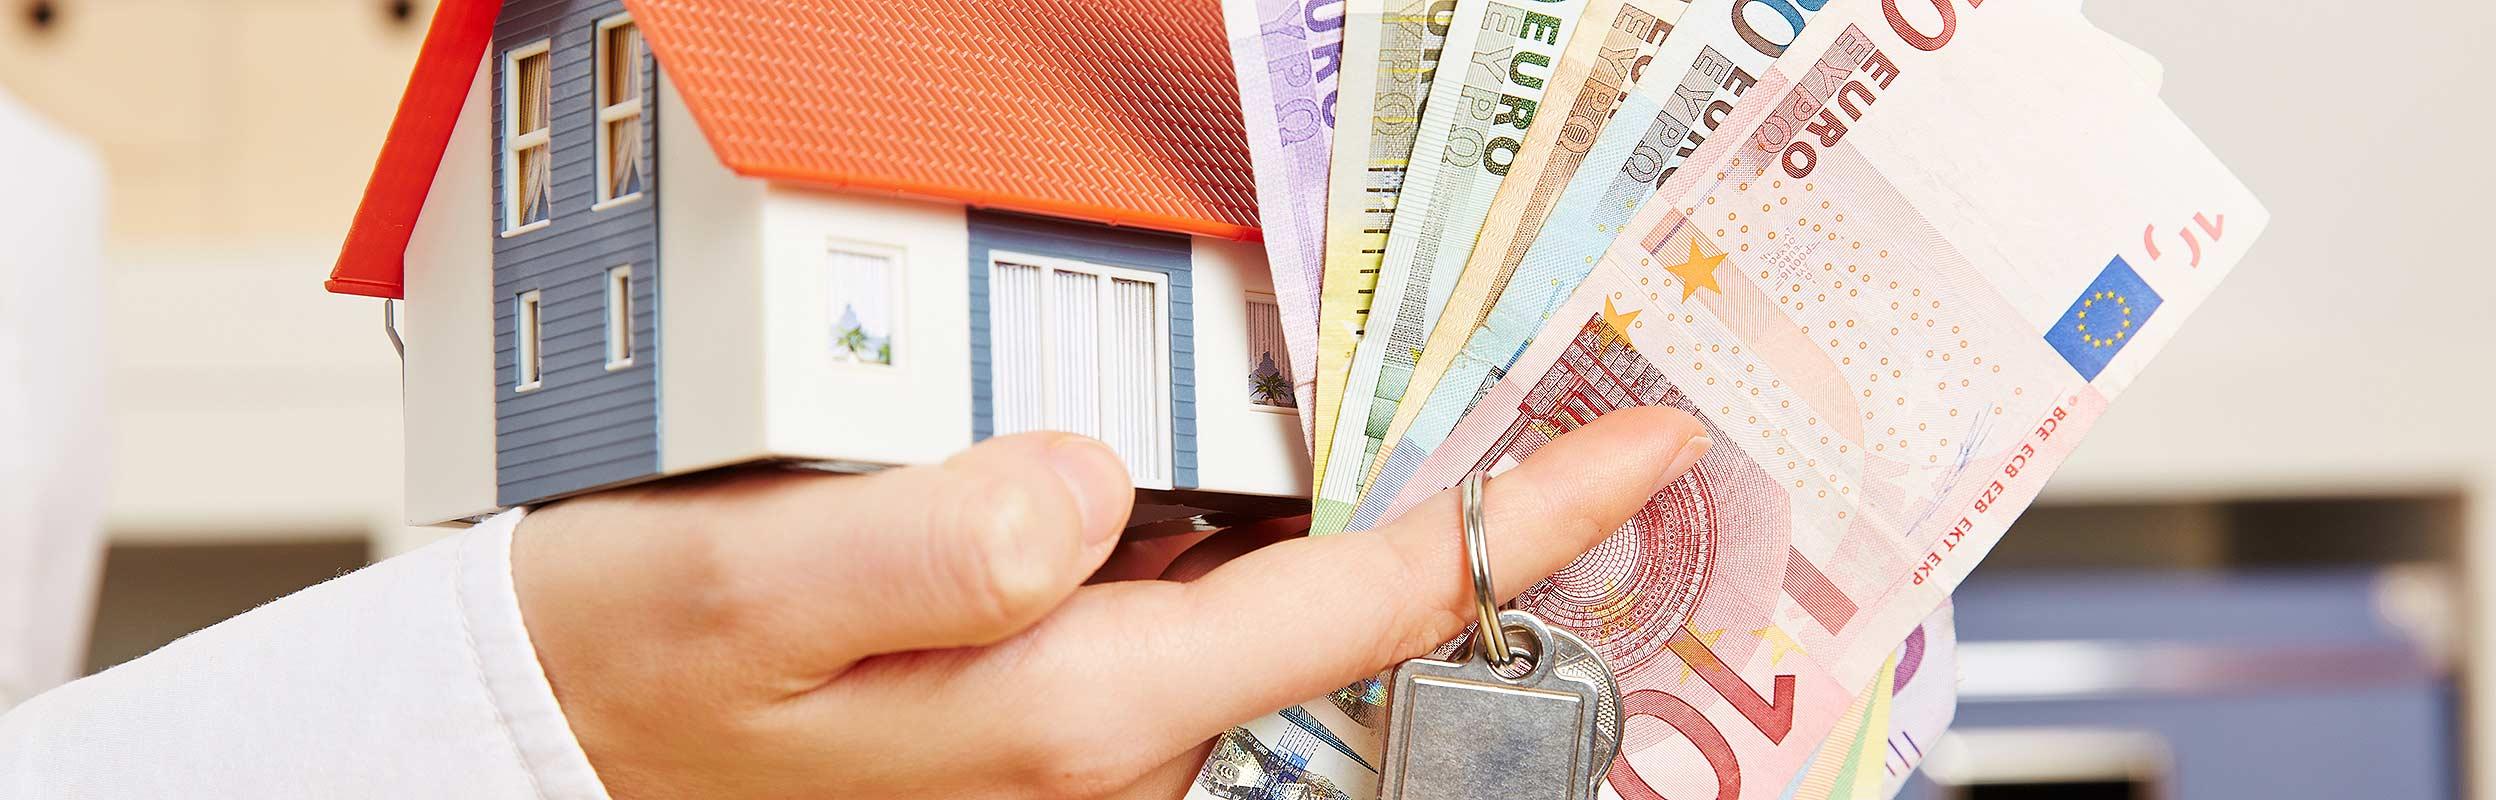 risques loyers impayés